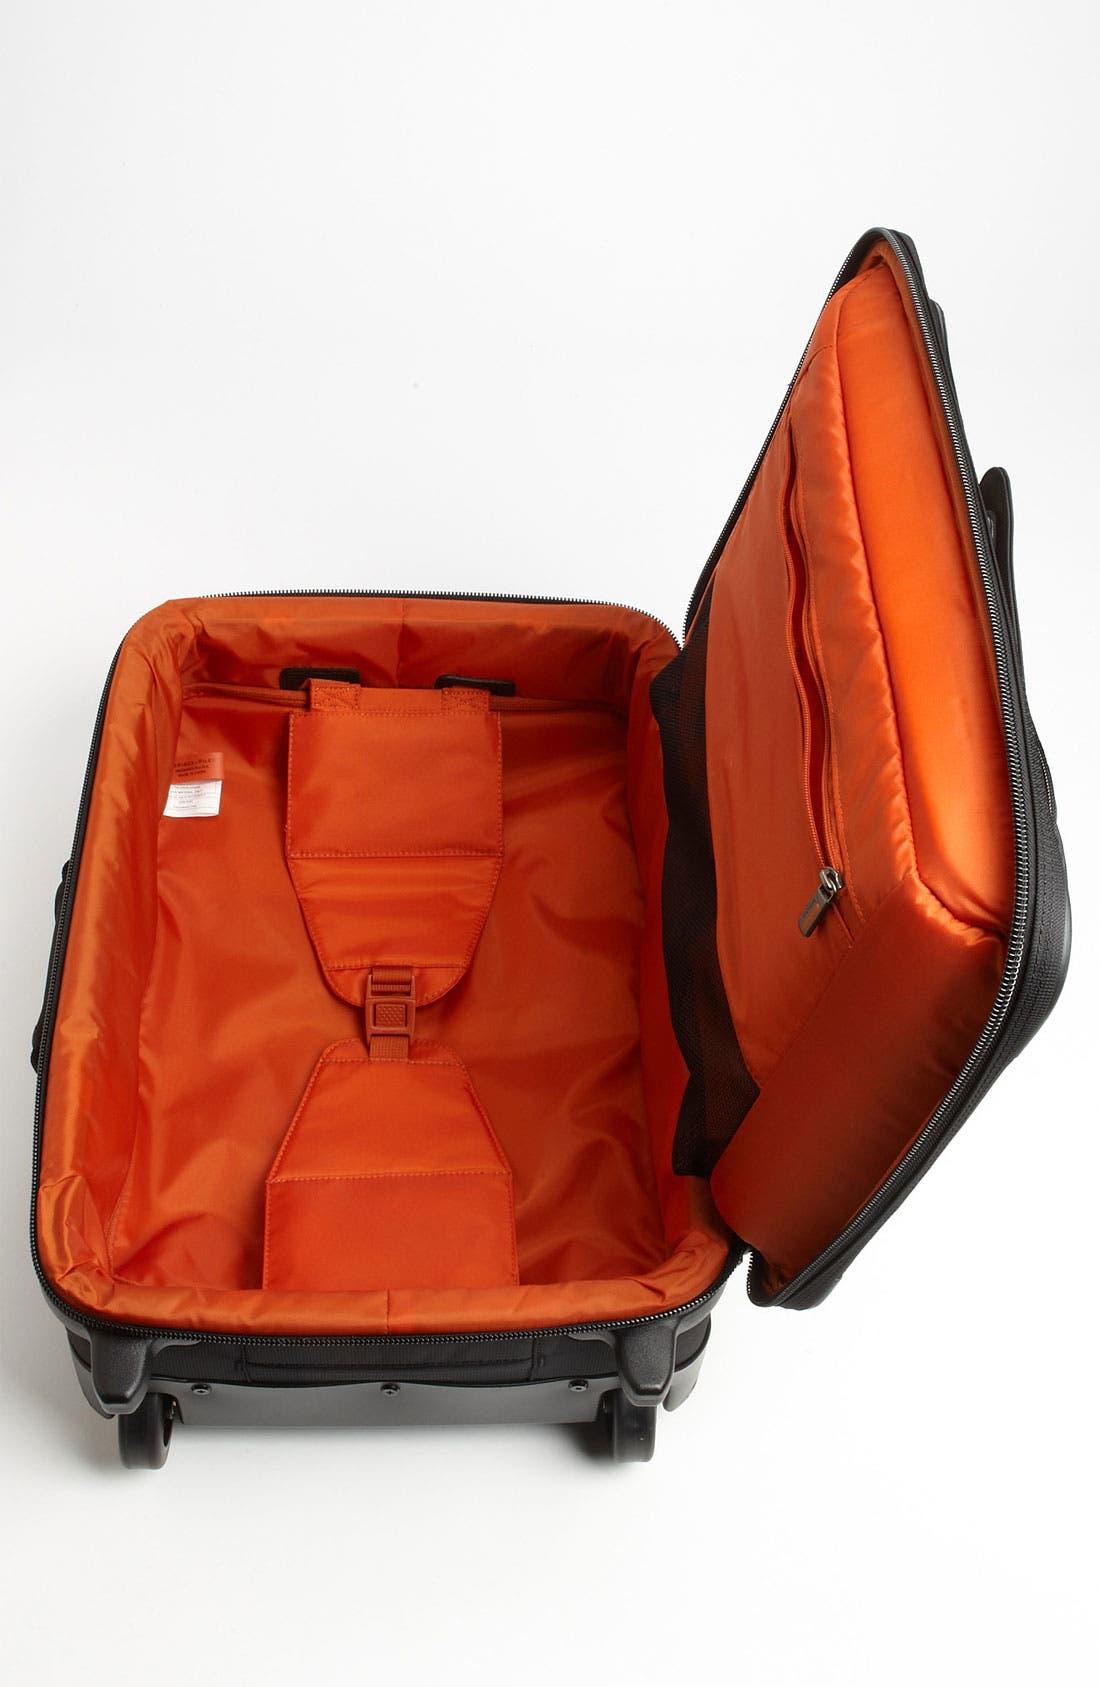 Alternate Image 3  - Briggs & Riley 'Verb - Fuse' Upright Suitcase (20 Inch)